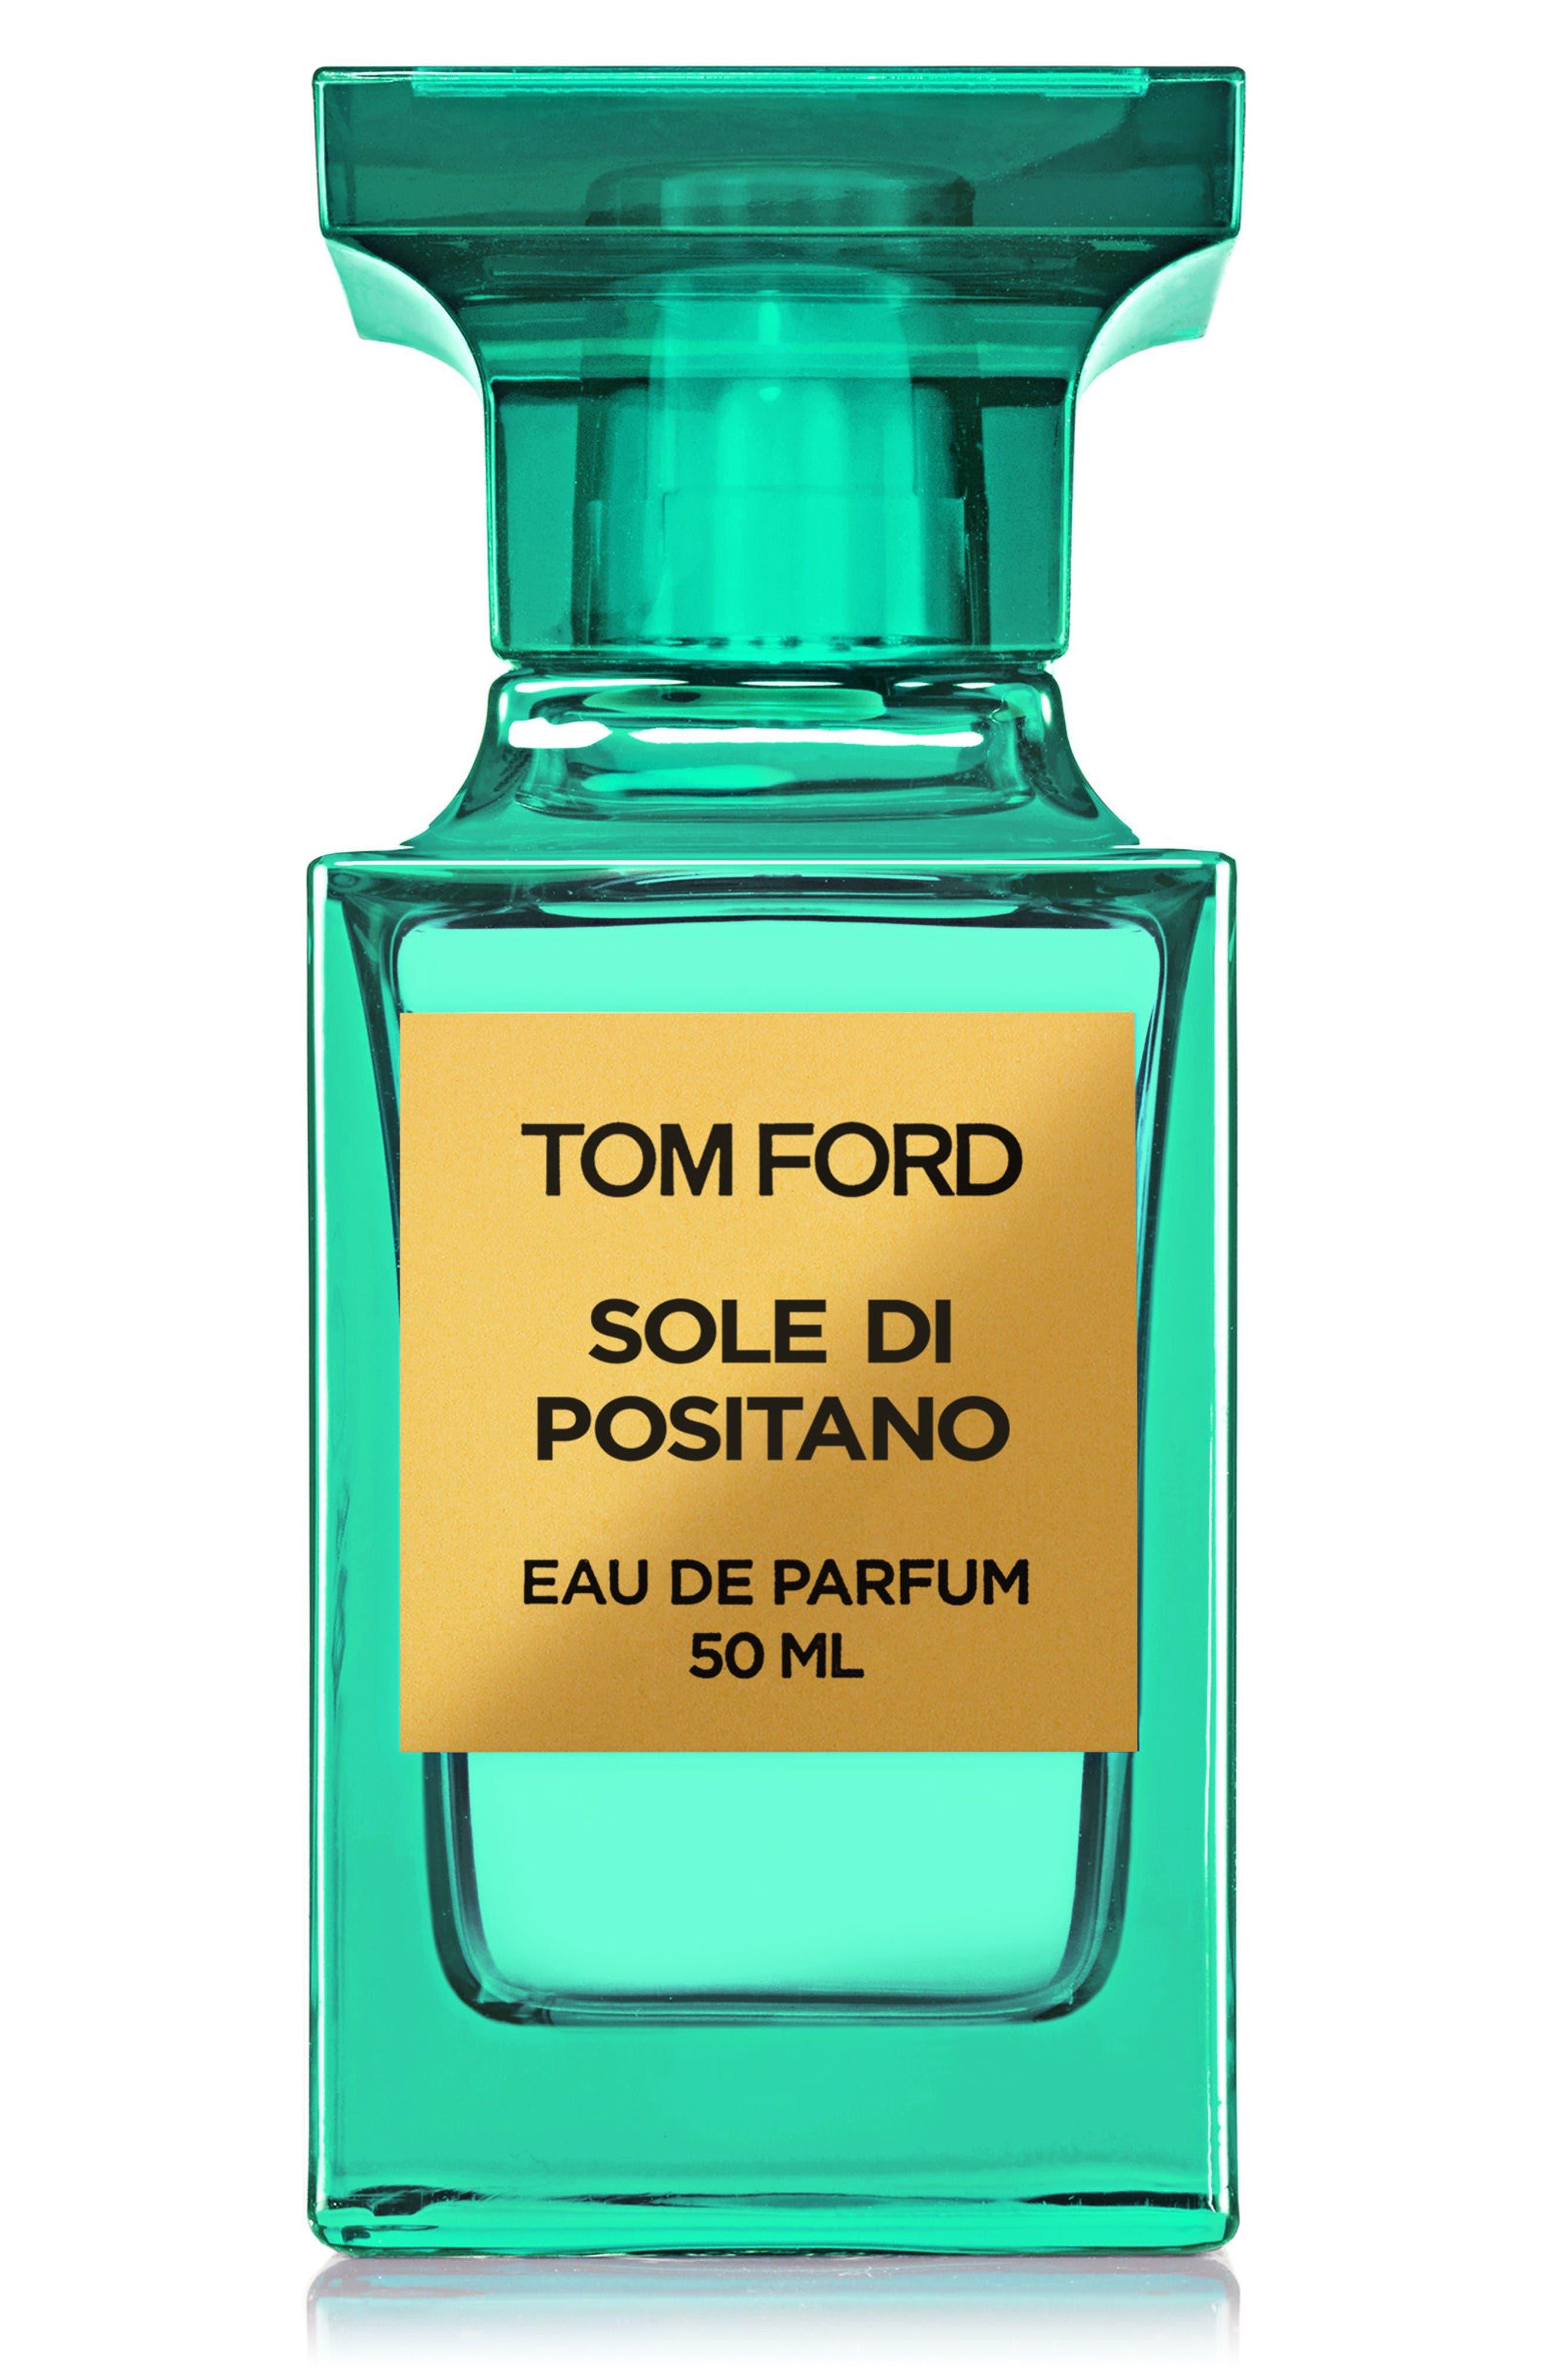 Alternate Image 1 Selected - Tom Ford Private Blend Sole di Positano Eau de Parfum